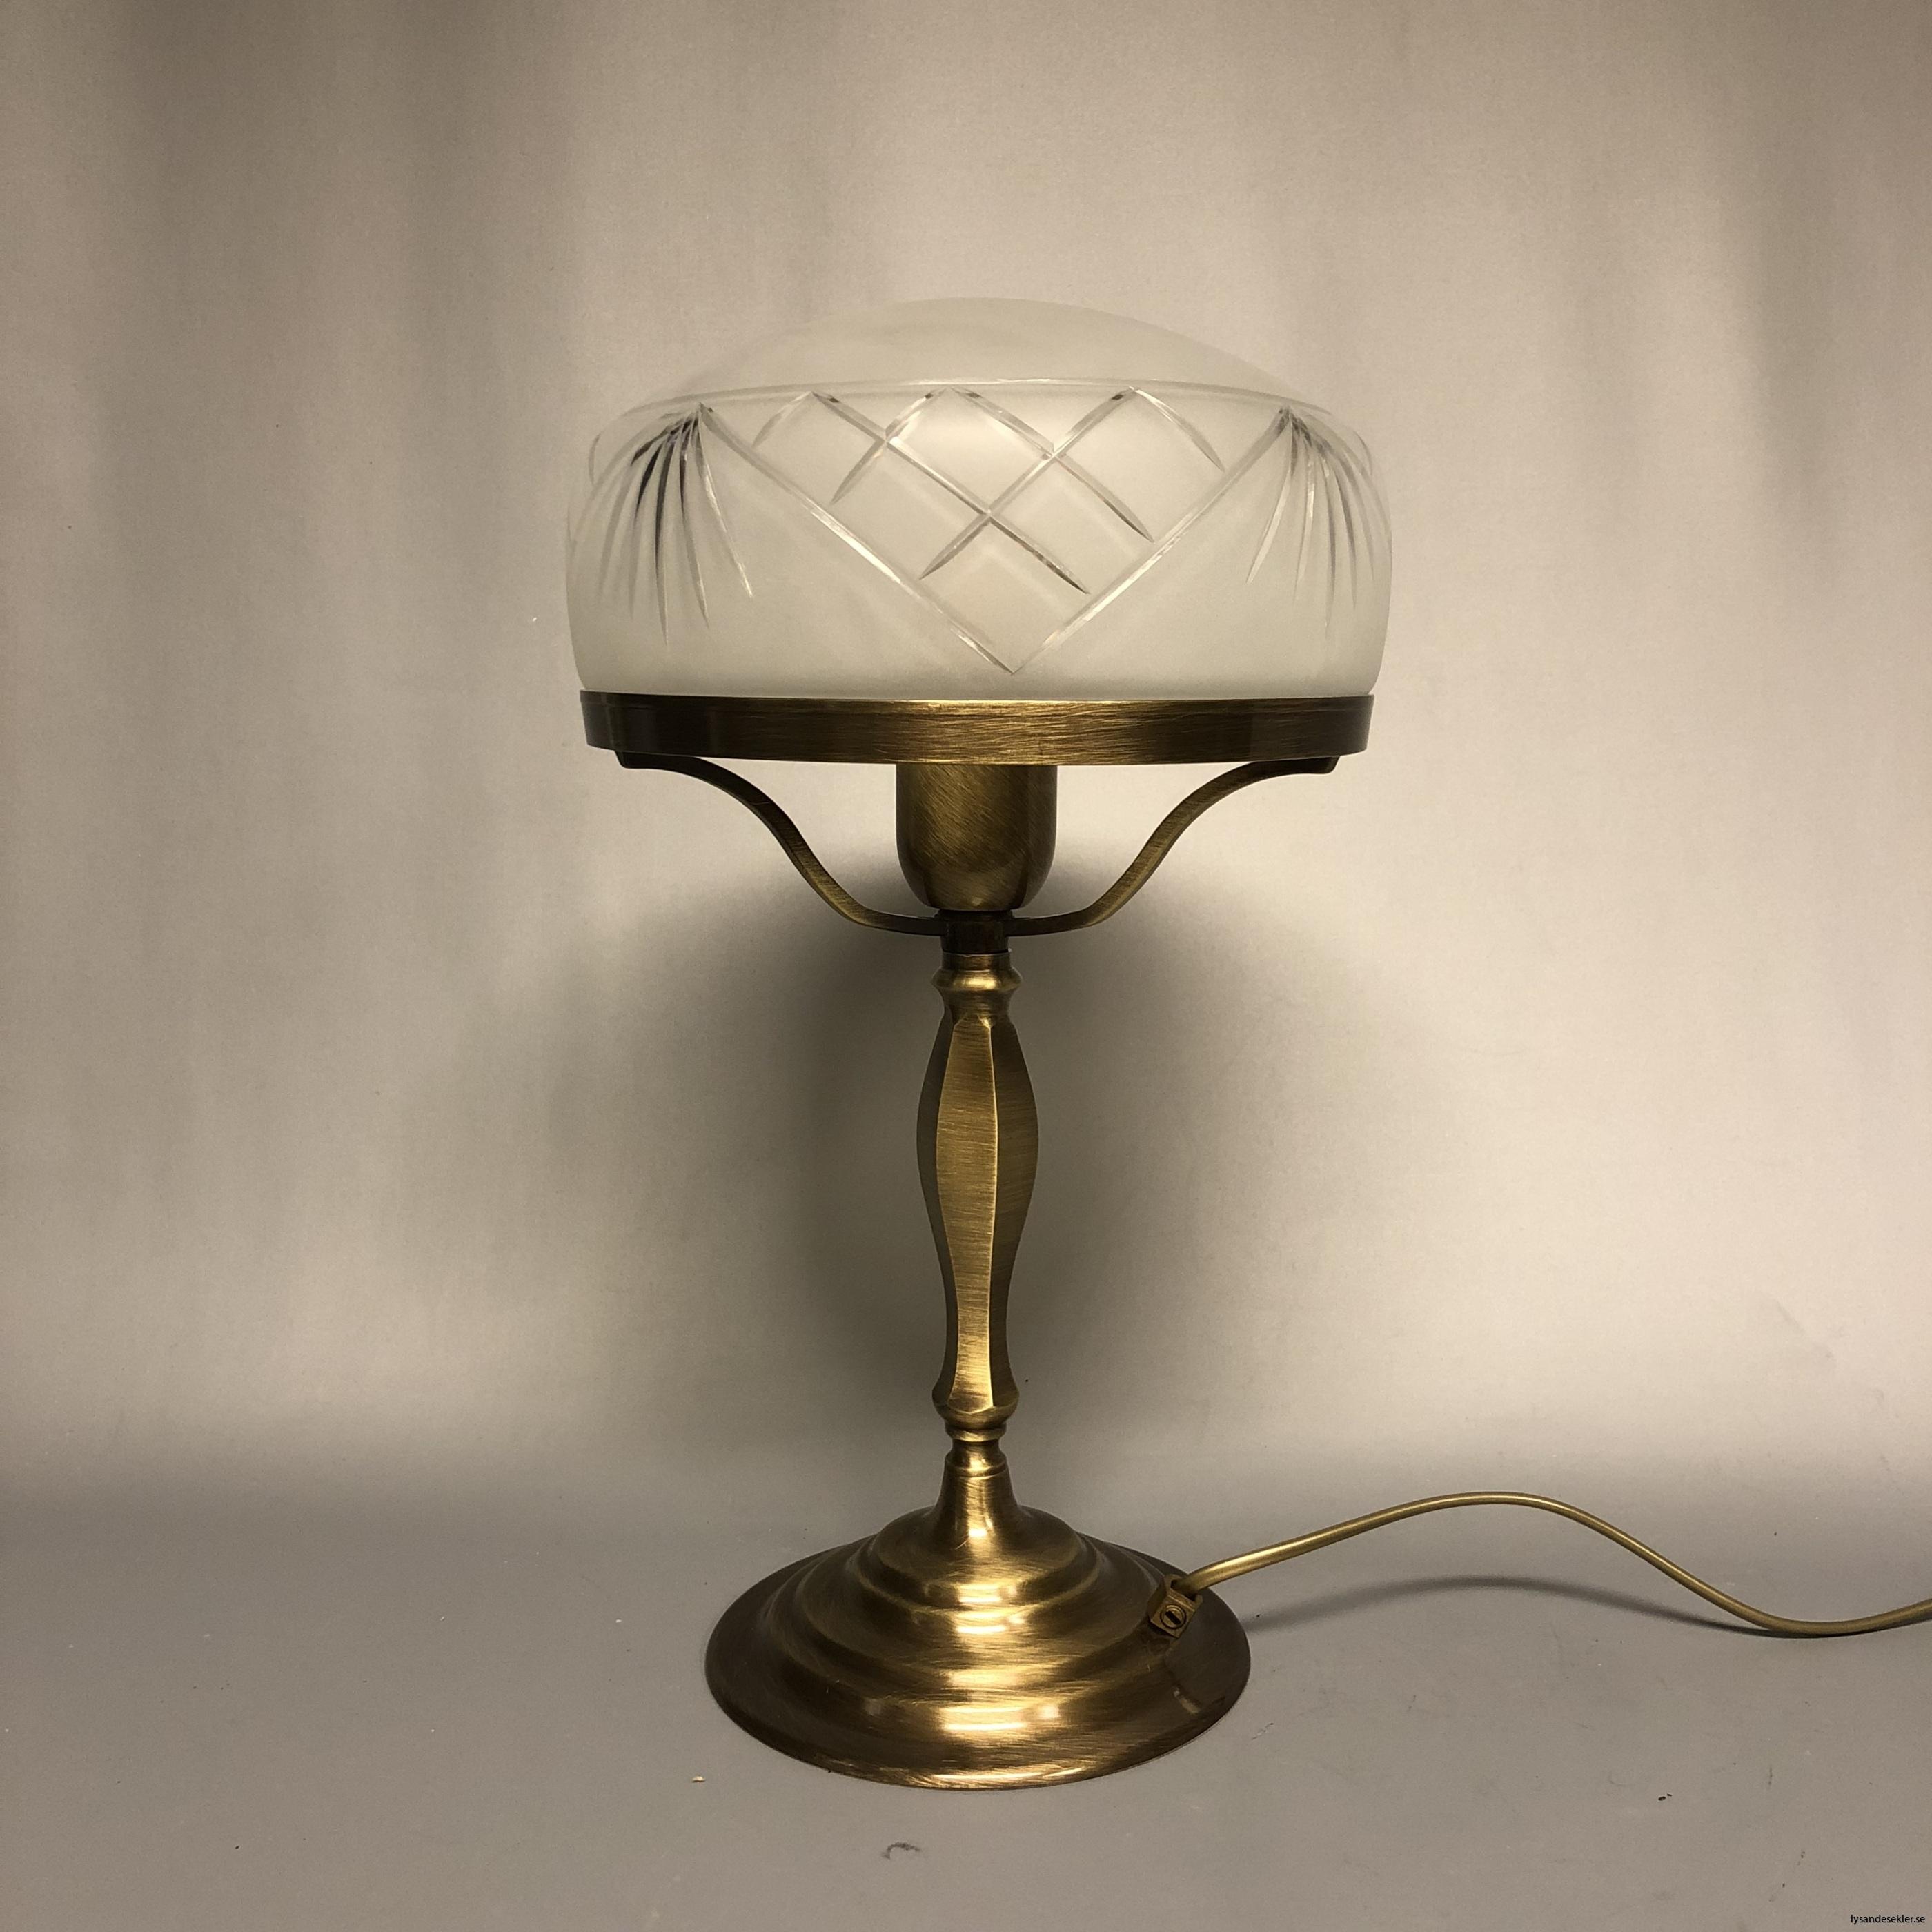 strindbergslampa strindbergslampor strindberg lampa skärm kupa strindbergsskärm strindbergskupa20